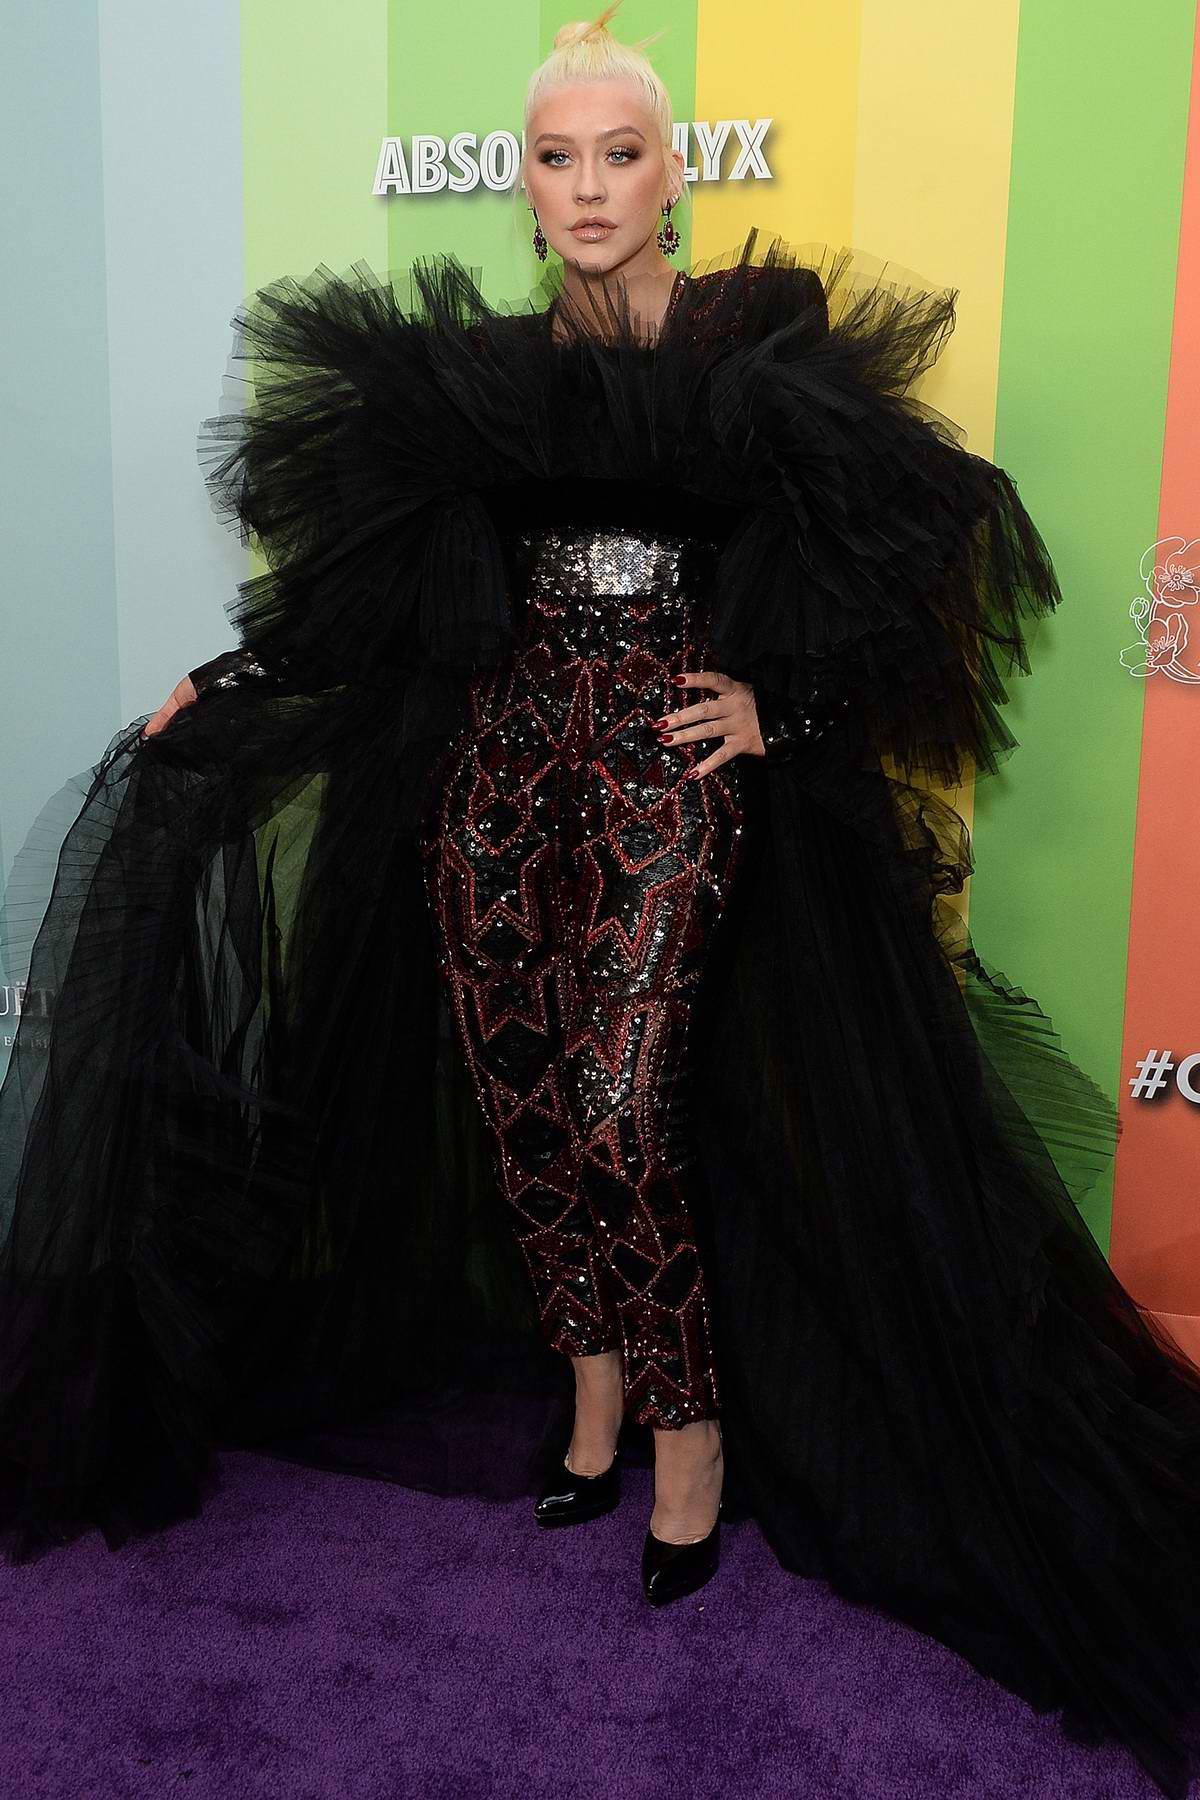 Christina Aguilera attends the 2019 amfAR Inspiration Gala at Milk Studios in Los Angeles